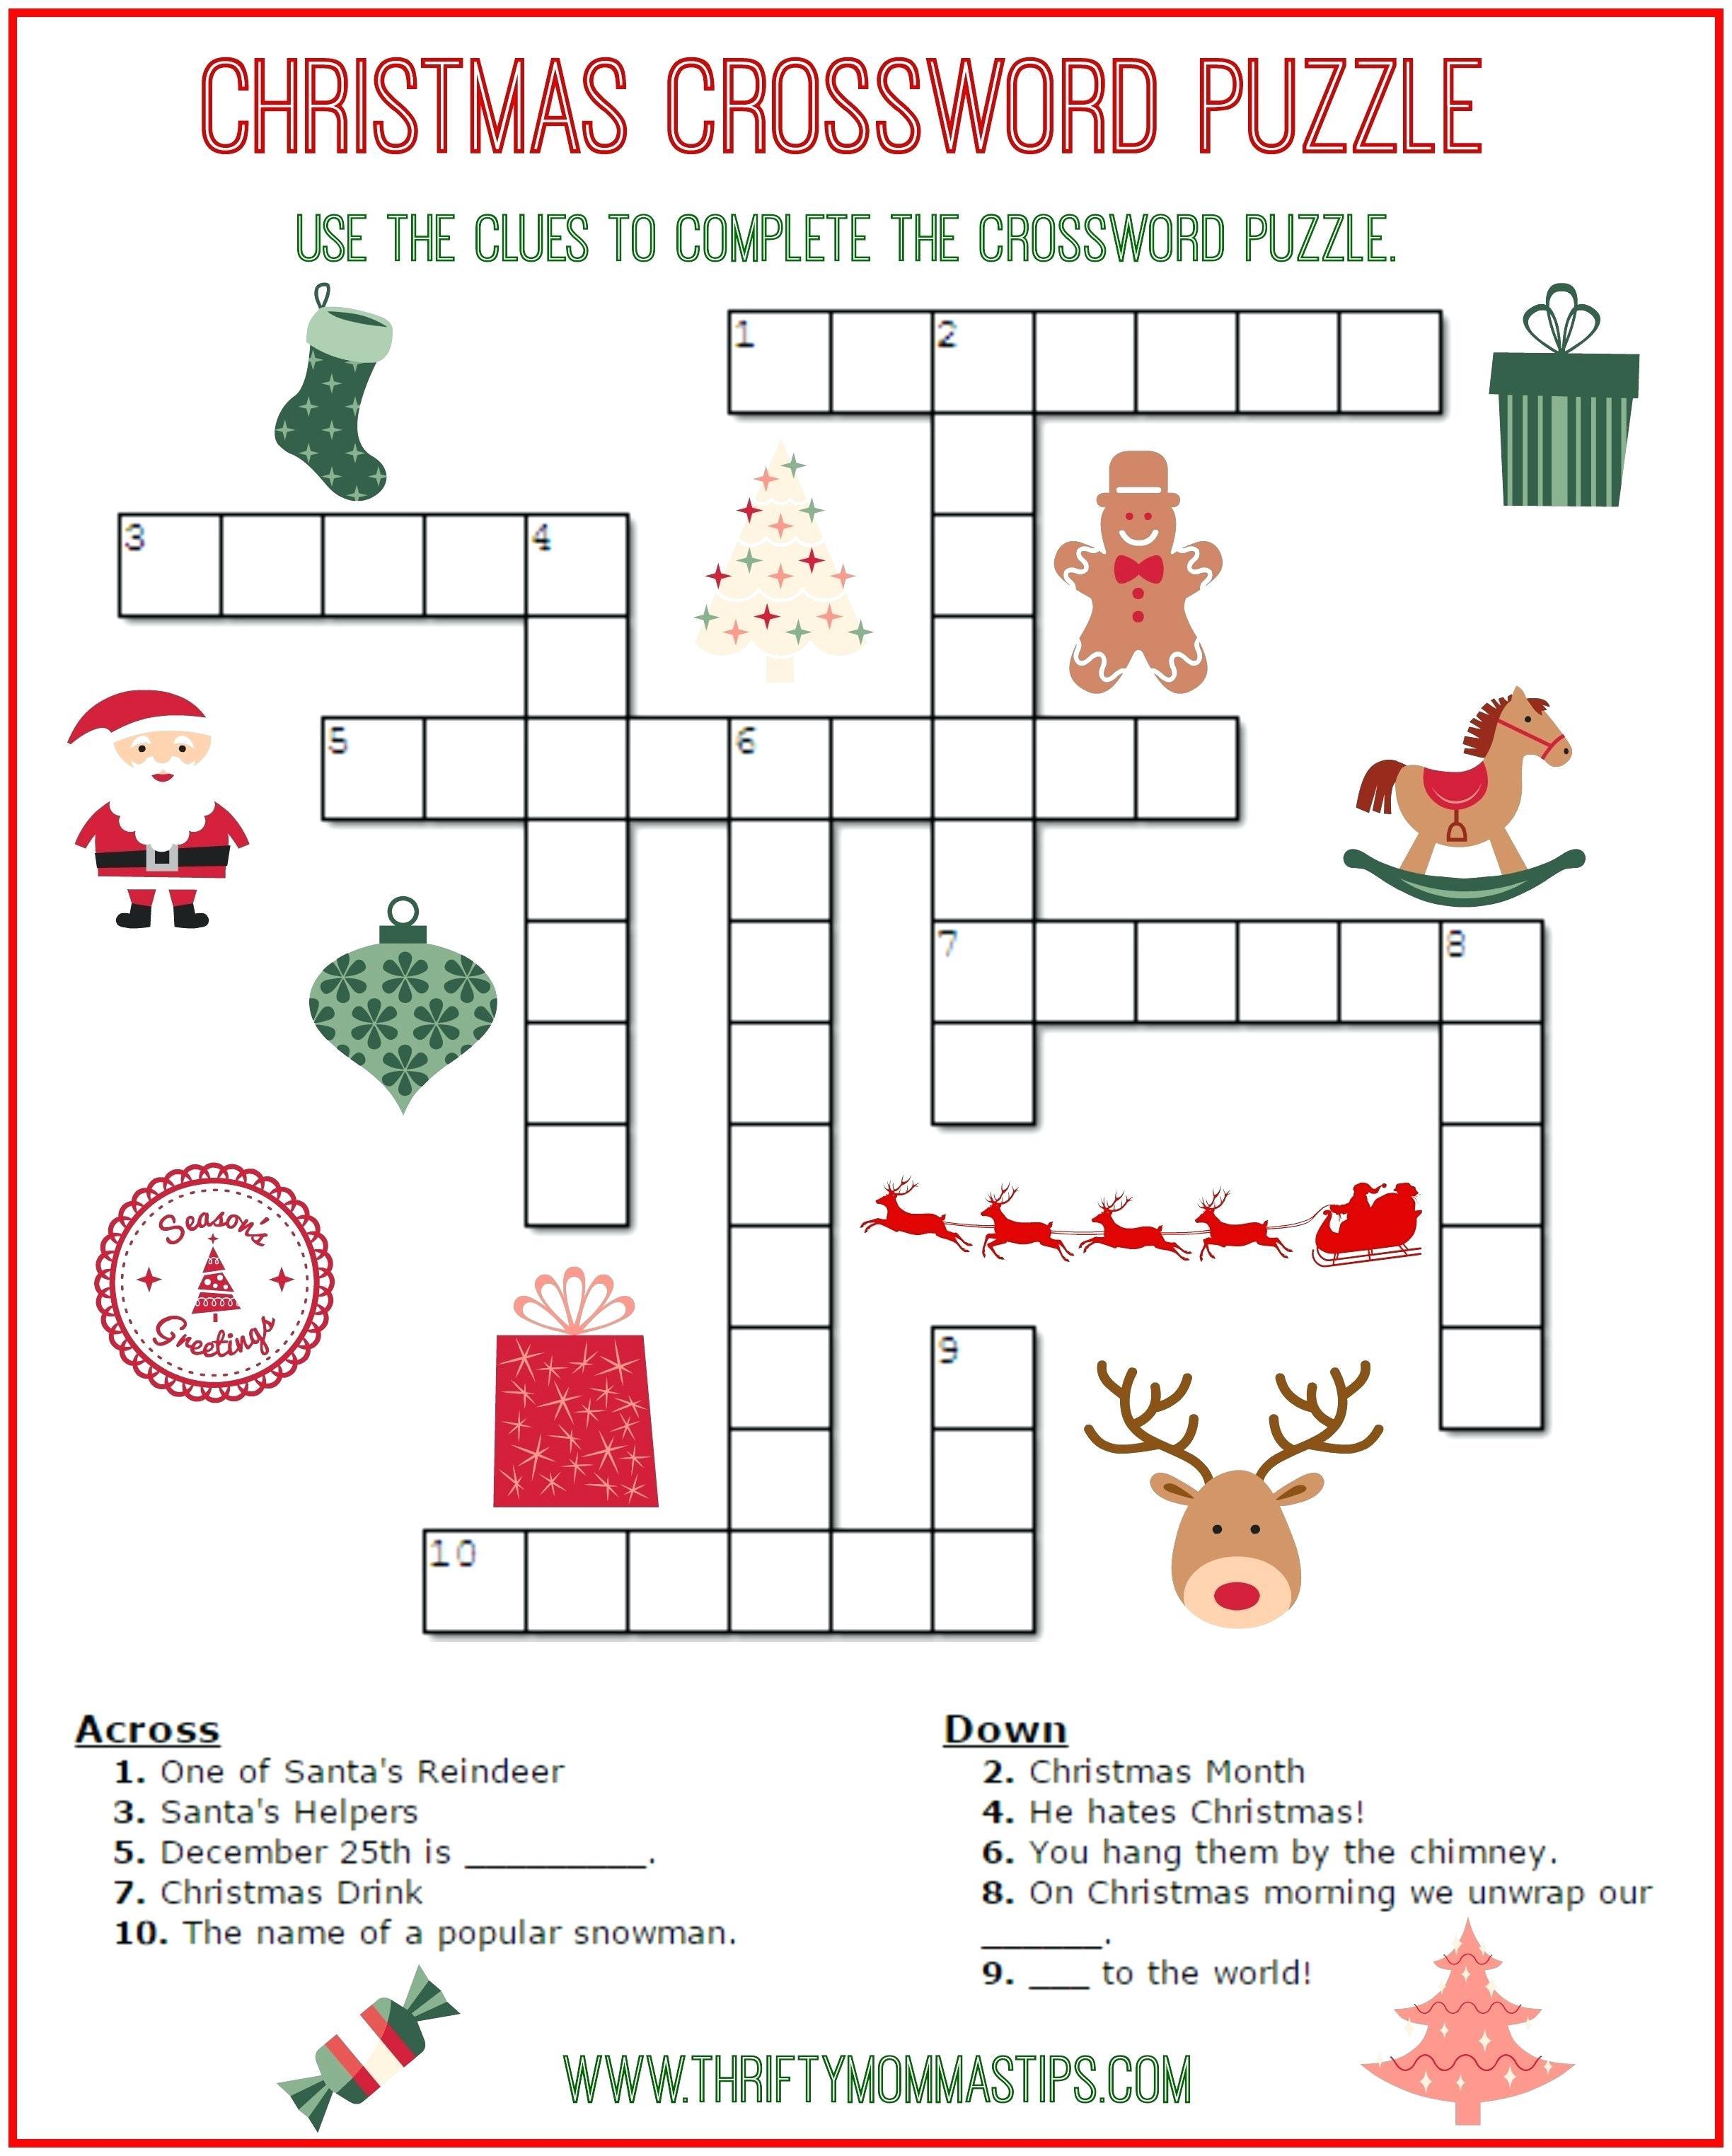 Free Printable Crossword Puzzles For Kids State Capitals Crossword - Printable Crossword Puzzles Elementary School